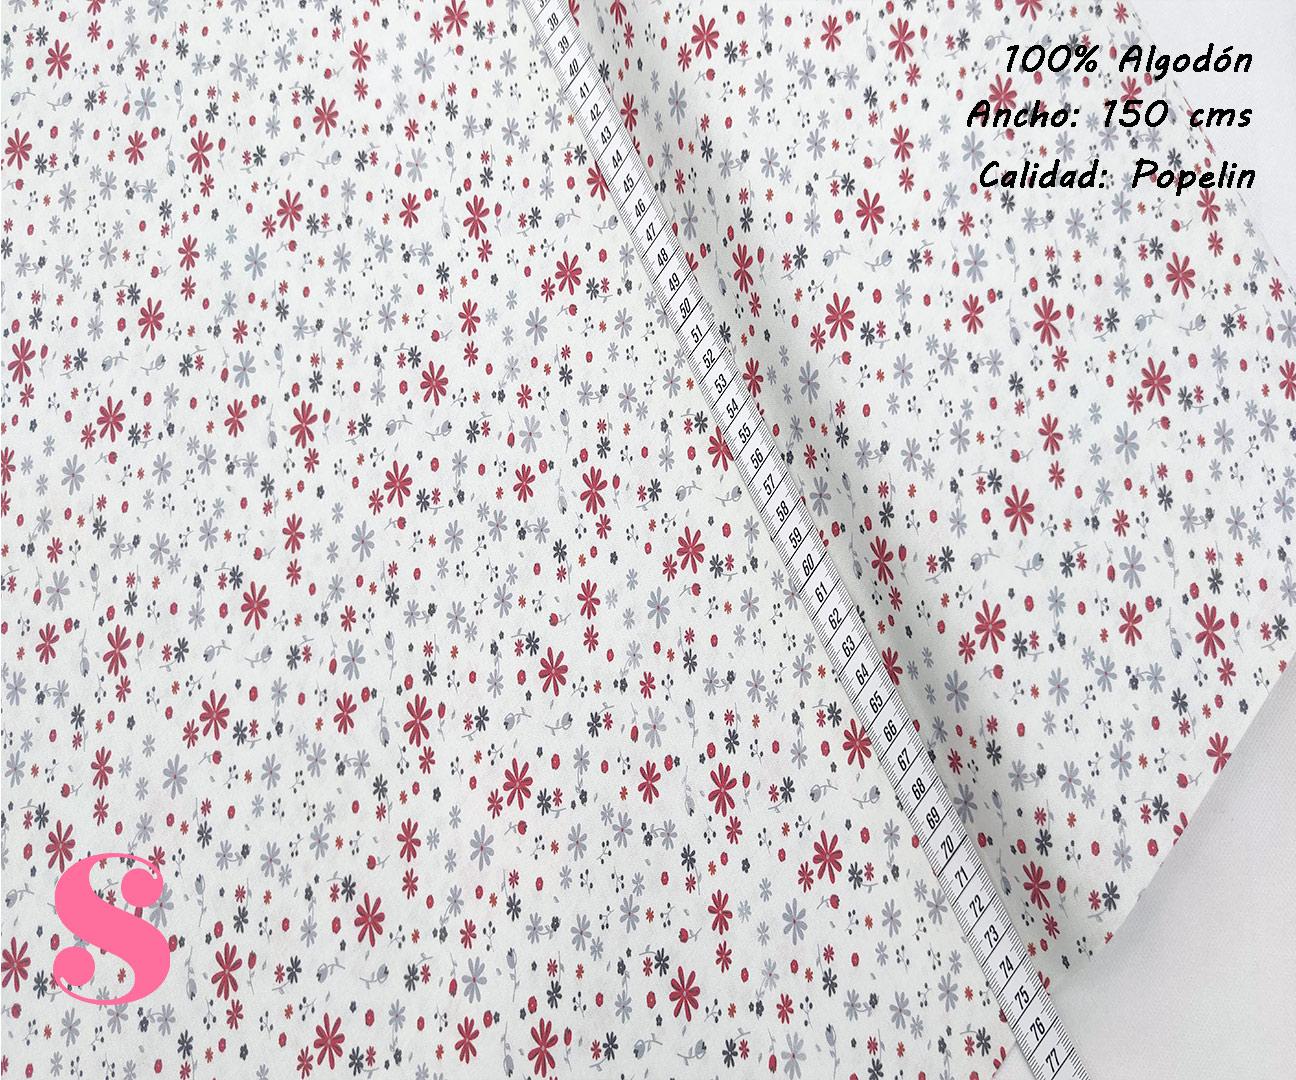 F2-florecitas-liberty-tono teja mujer-tejidos-algodón-estampado-popelin,Tejido Estampado Florecitas Liberty Teja E3